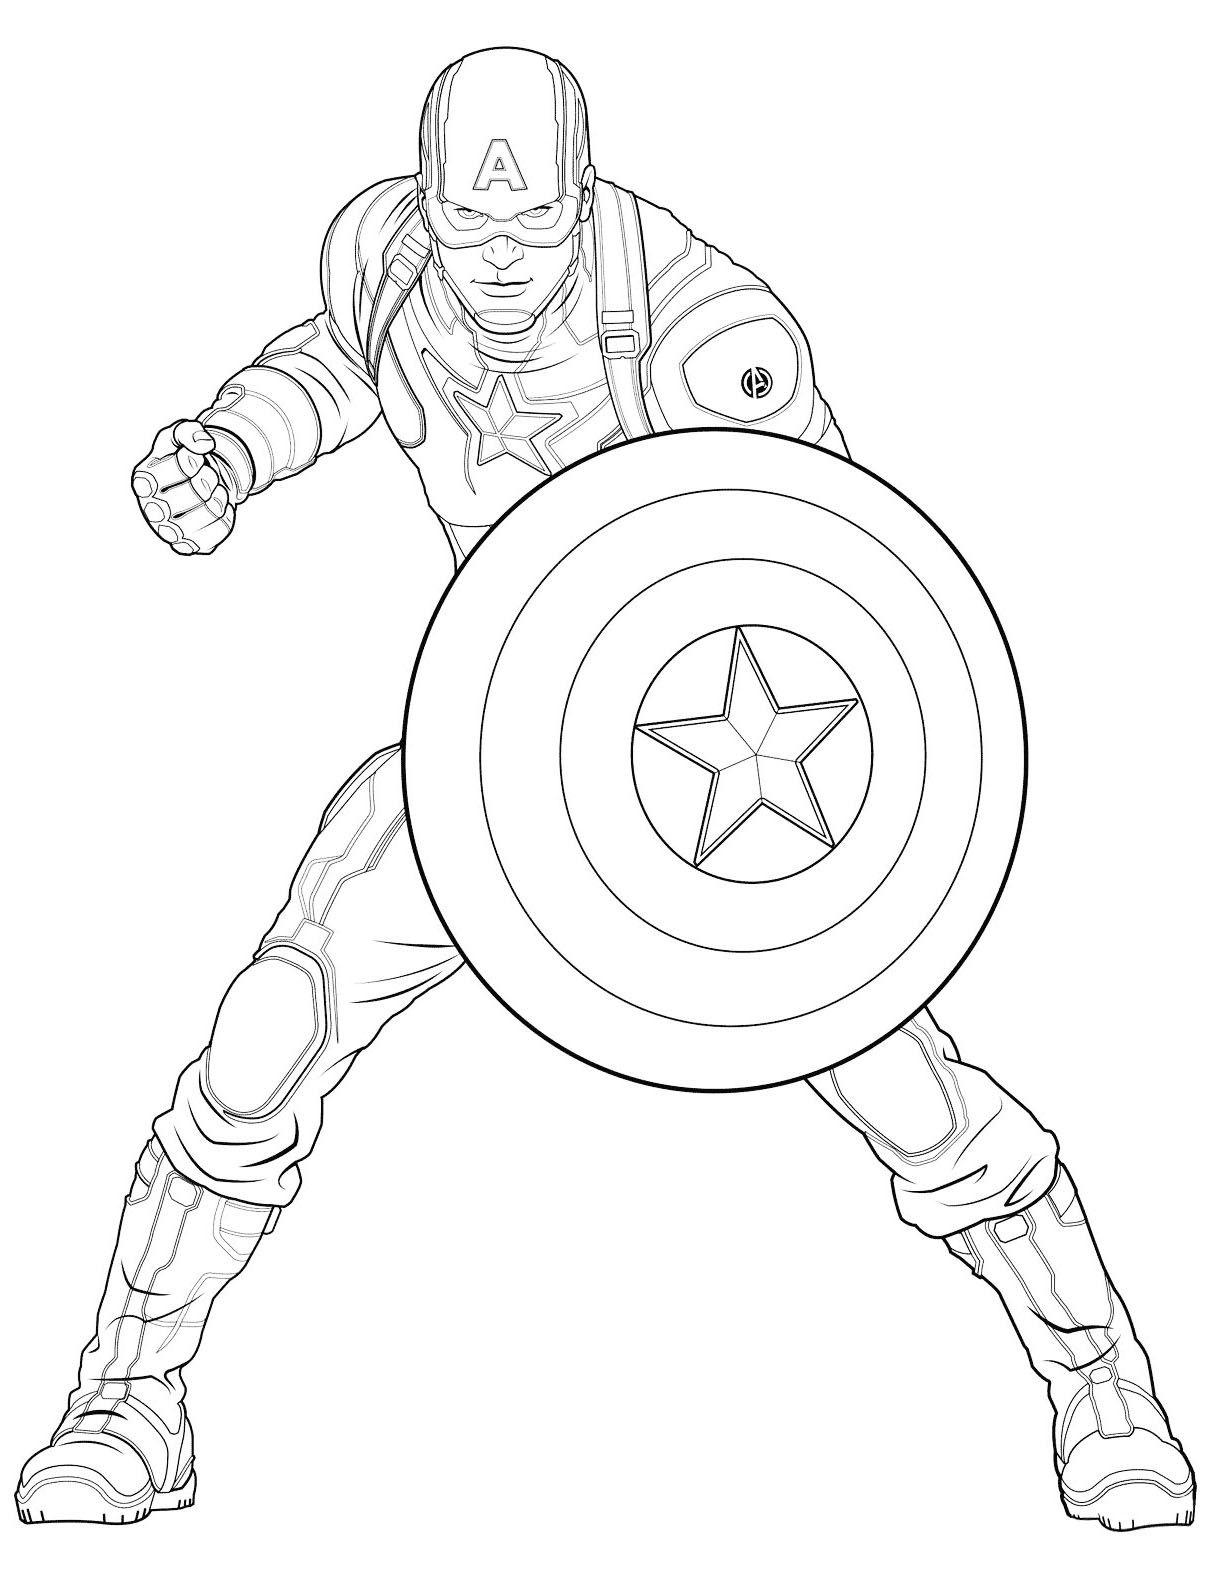 Marvel Avengers Captan America Pdf Coloring Pages Avengers Coloring Pages Superhero Coloring Pages Captain America Coloring Pages